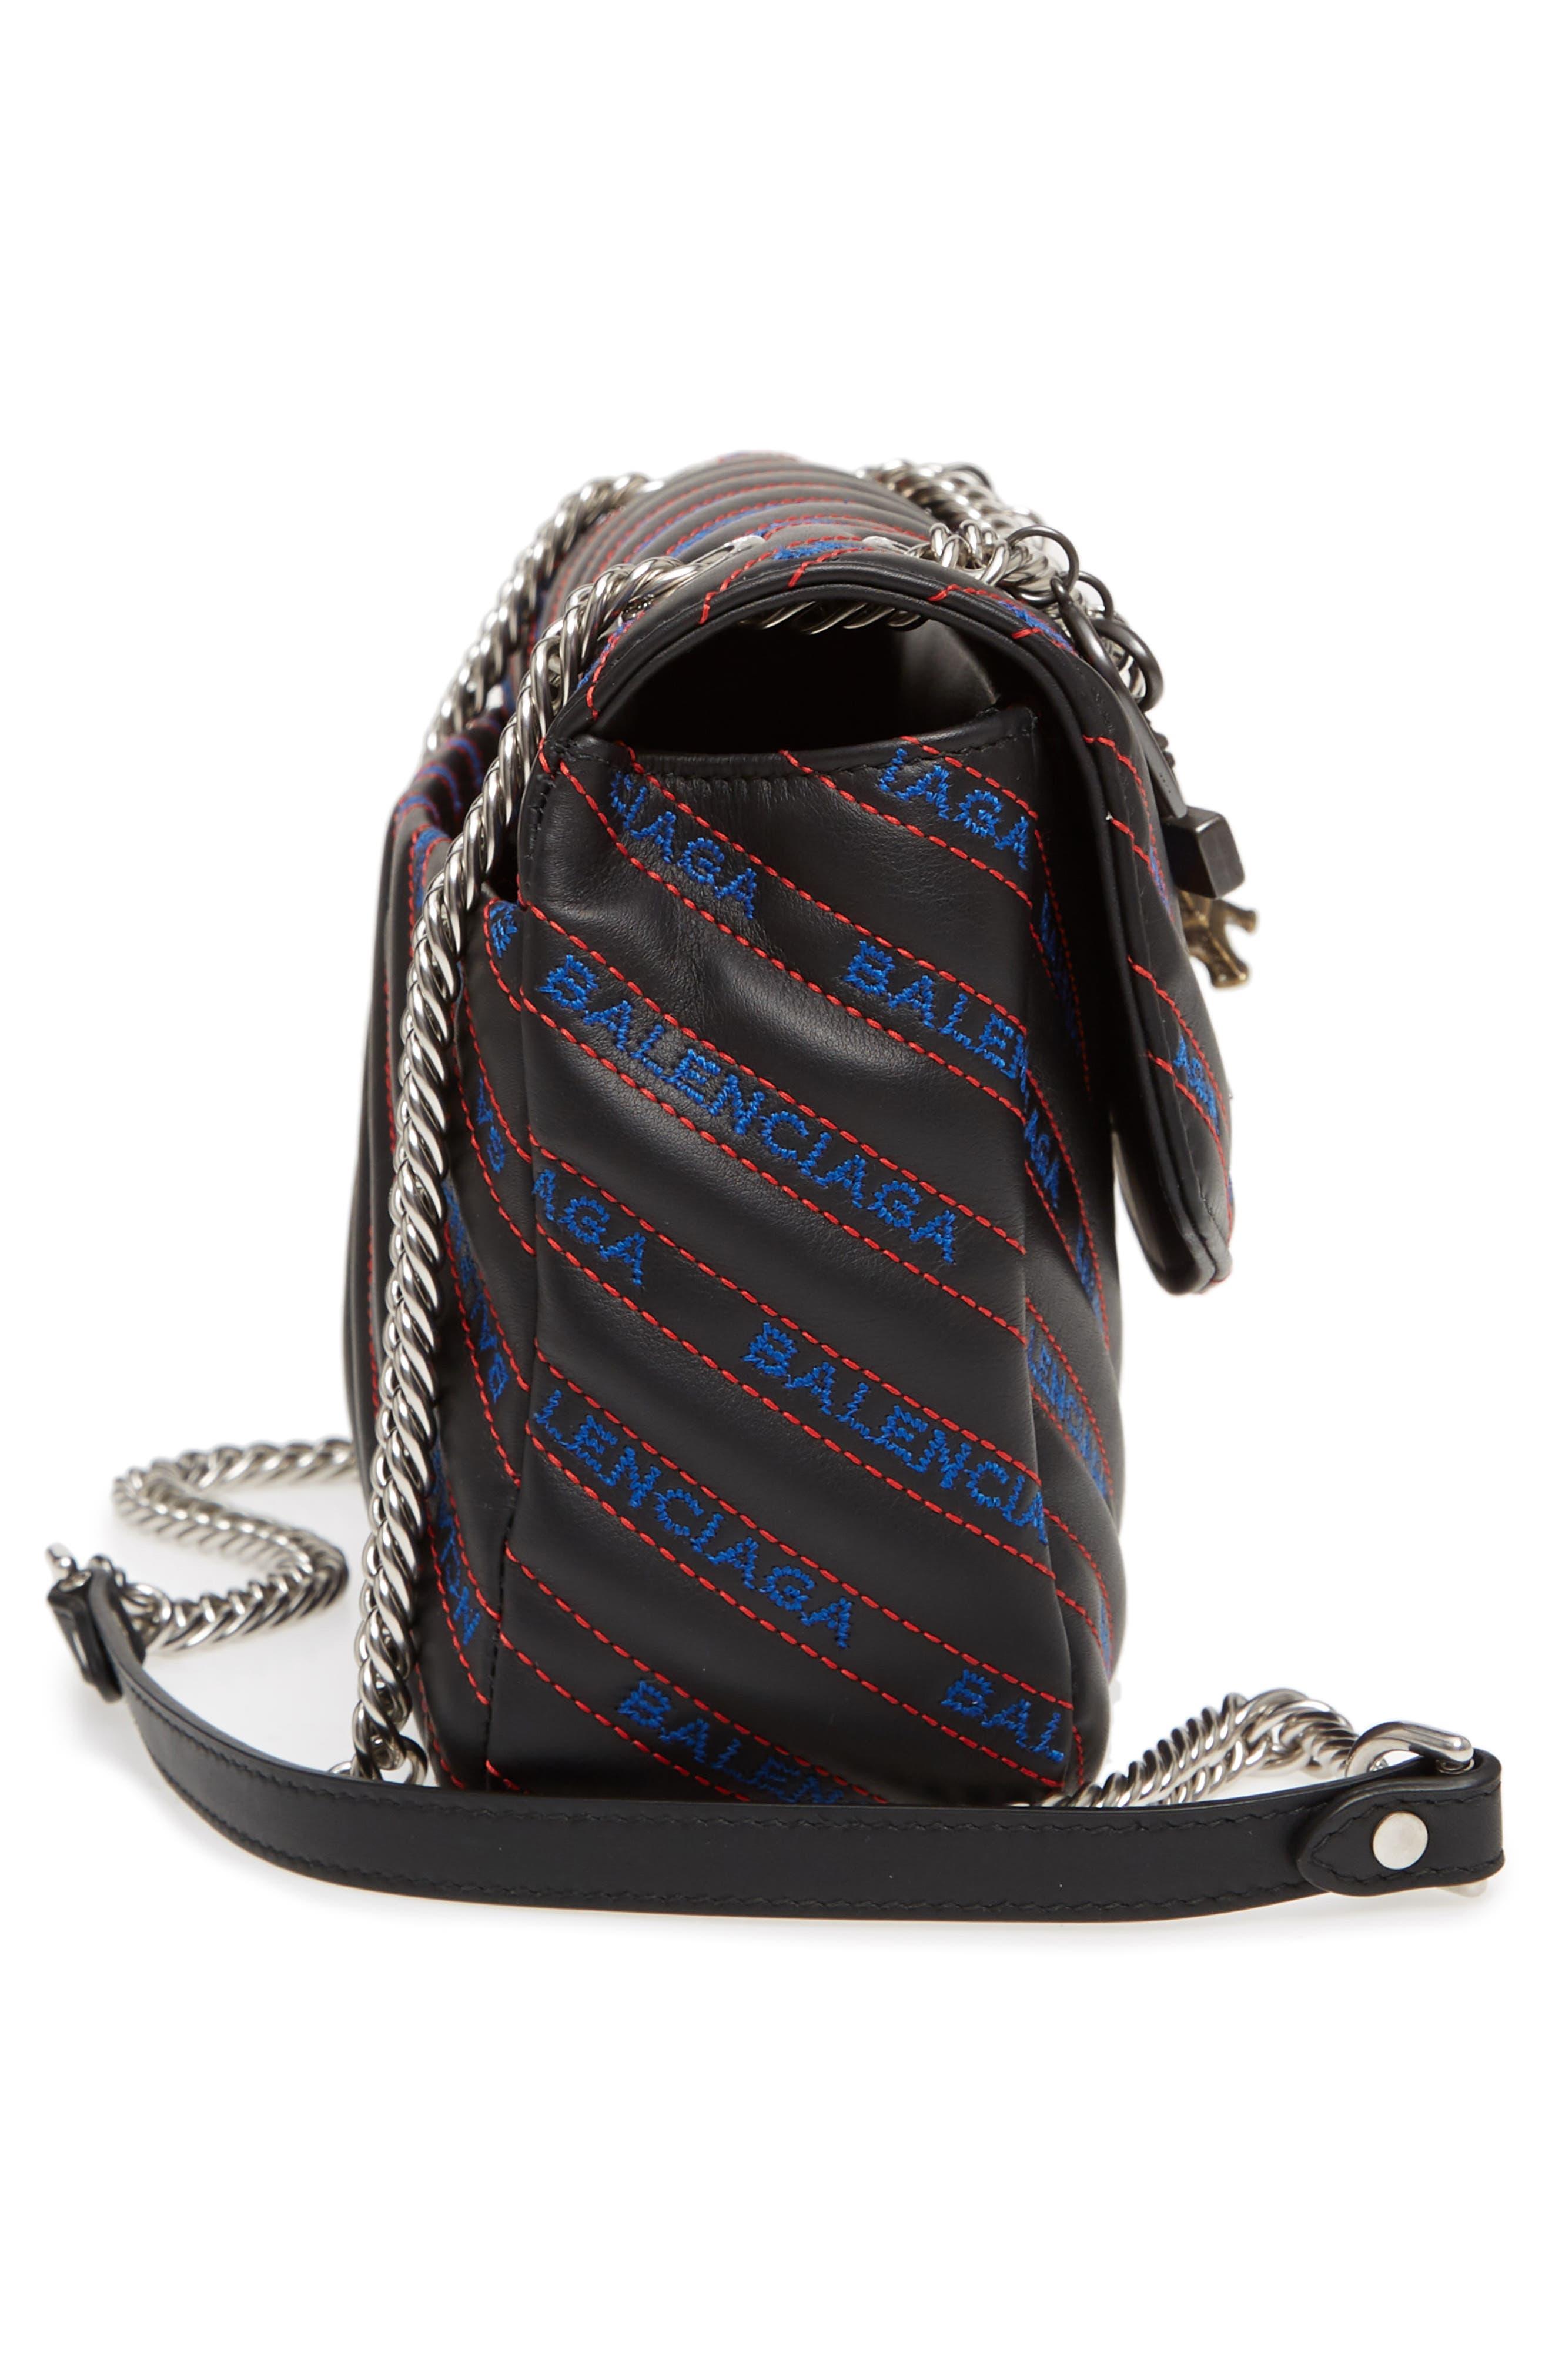 Medium BB Round Logo Charm Crossbody Bag,                             Alternate thumbnail 5, color,                             Noir/ Bleu/ Rouge